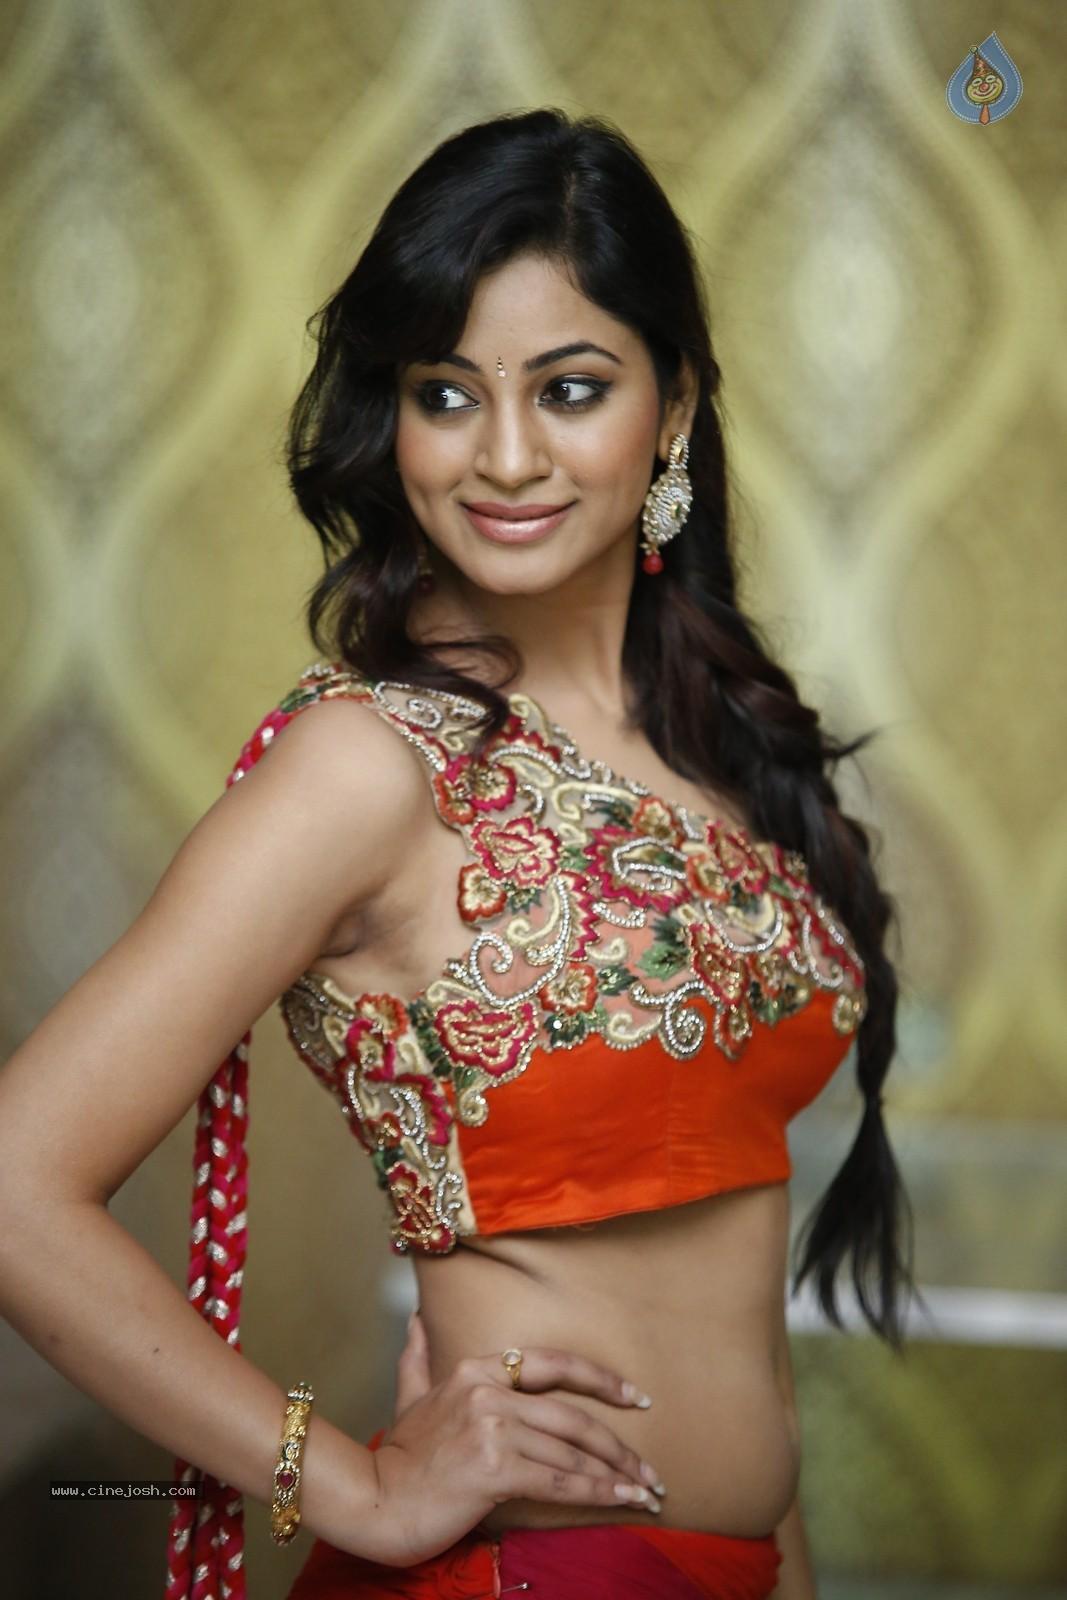 Shilpi Sharma Hot Photos - Photo 15 of 65